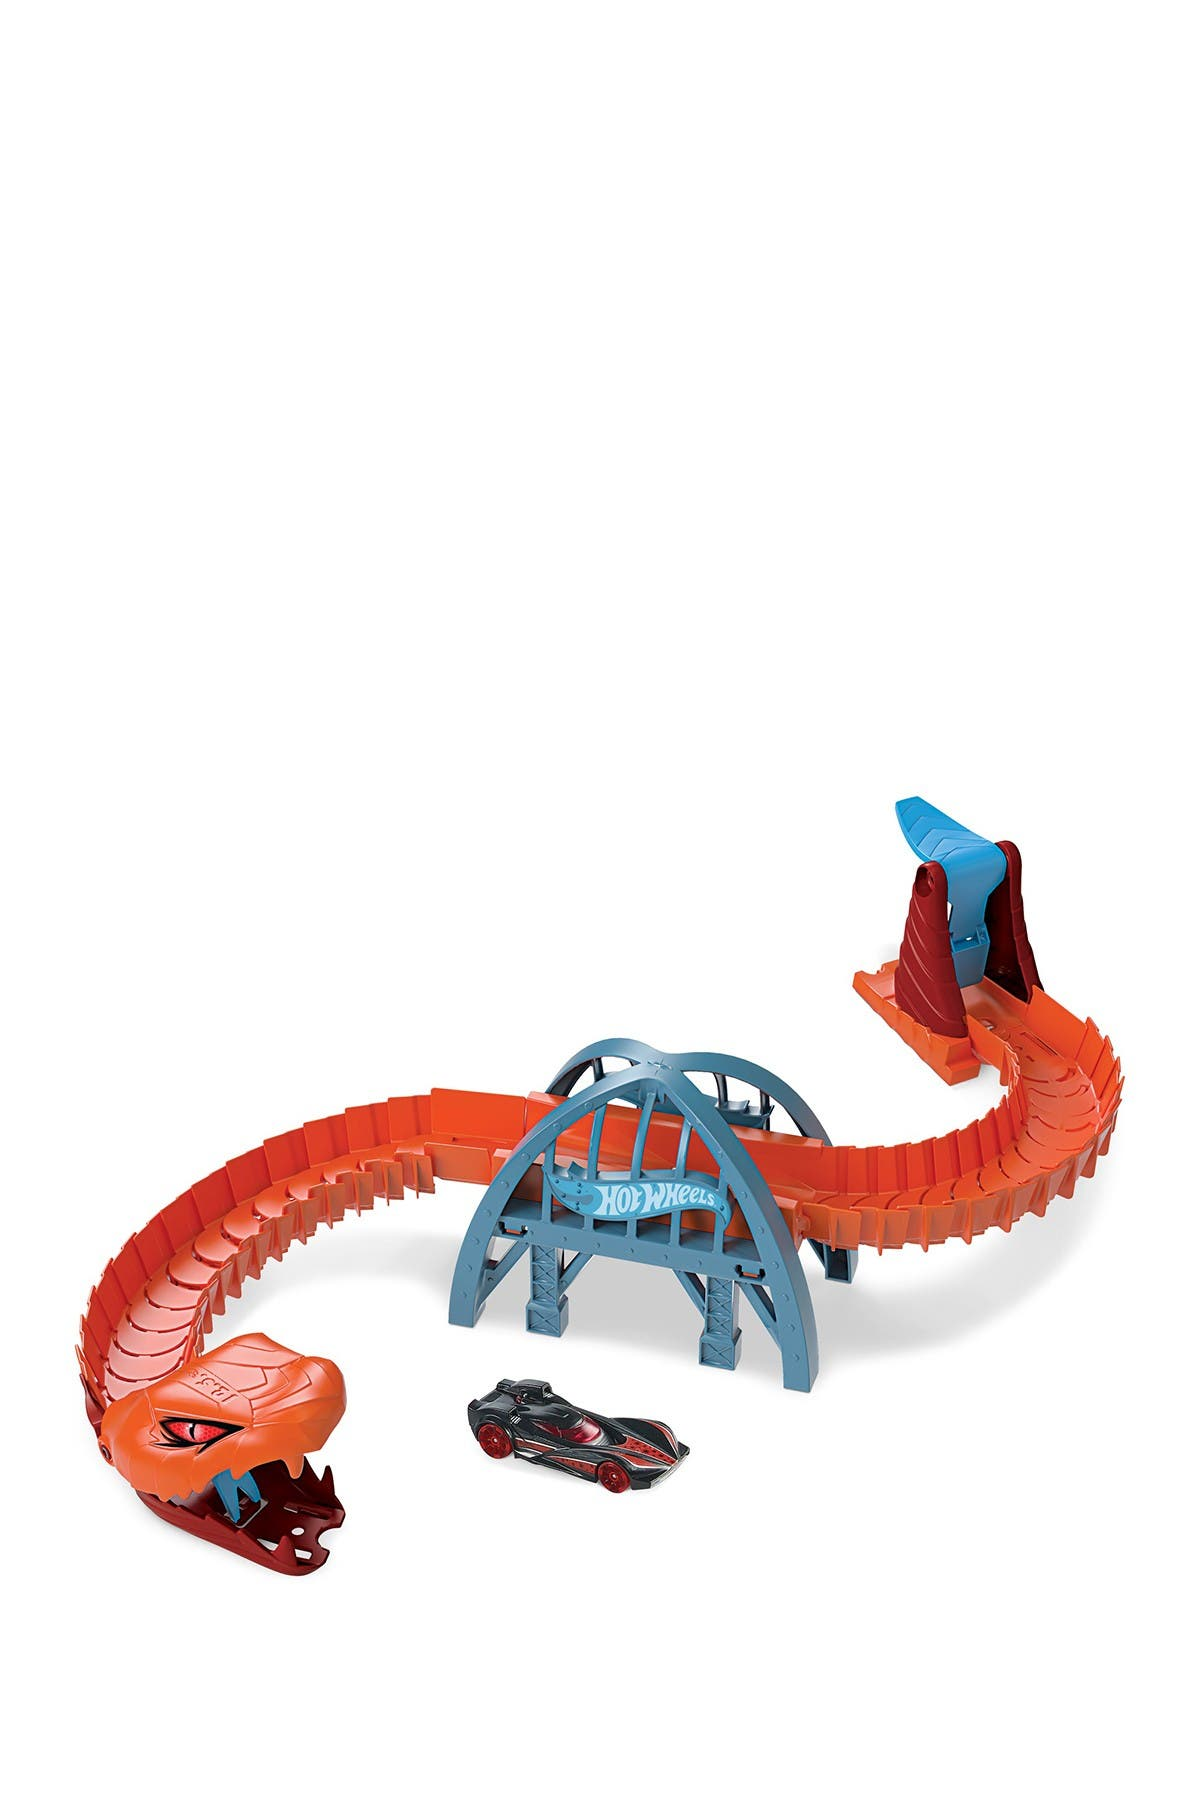 Image of Mattel Hot Wheels® Viper Bridge Attack Play Set